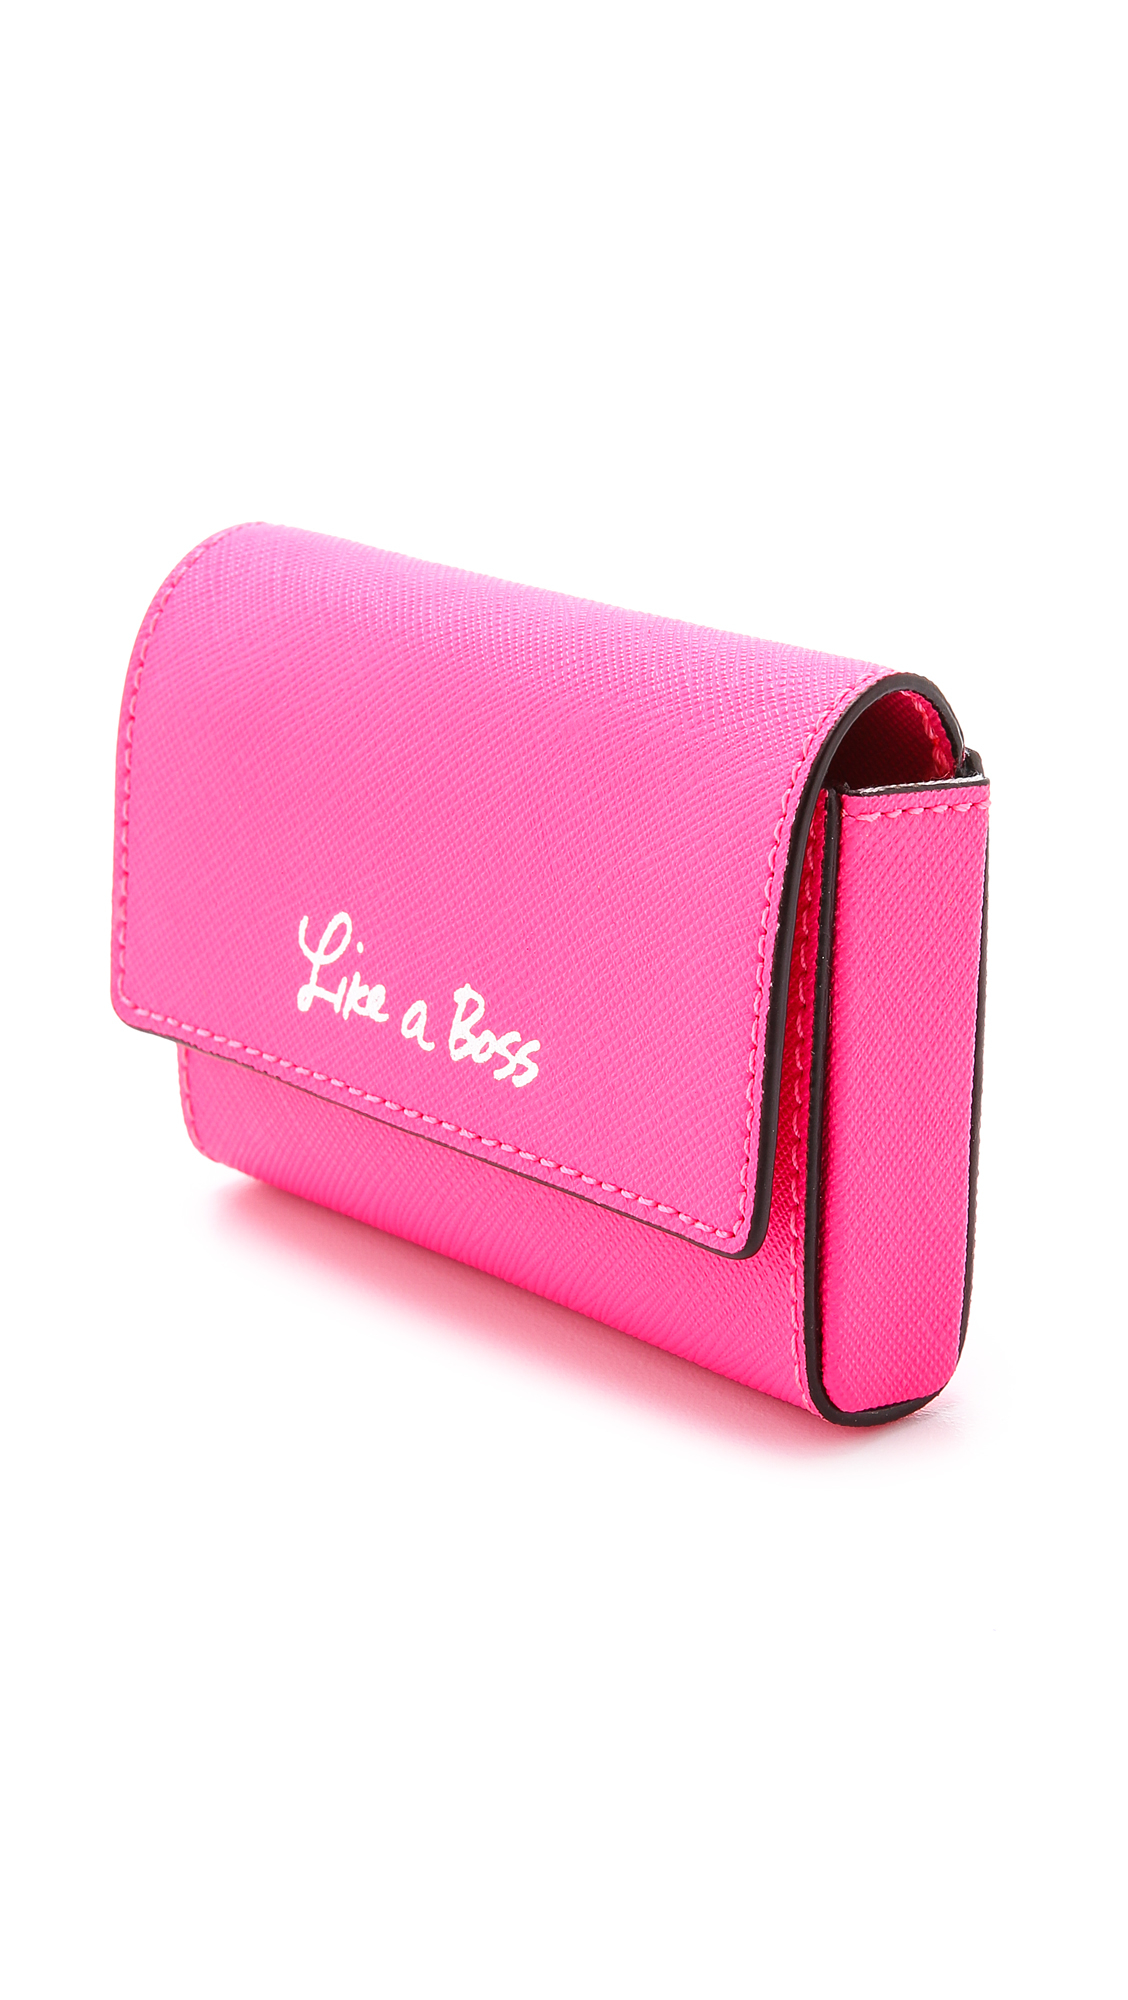 Rebecca minkoff Like A Boss Business Card Holder Electric Pink